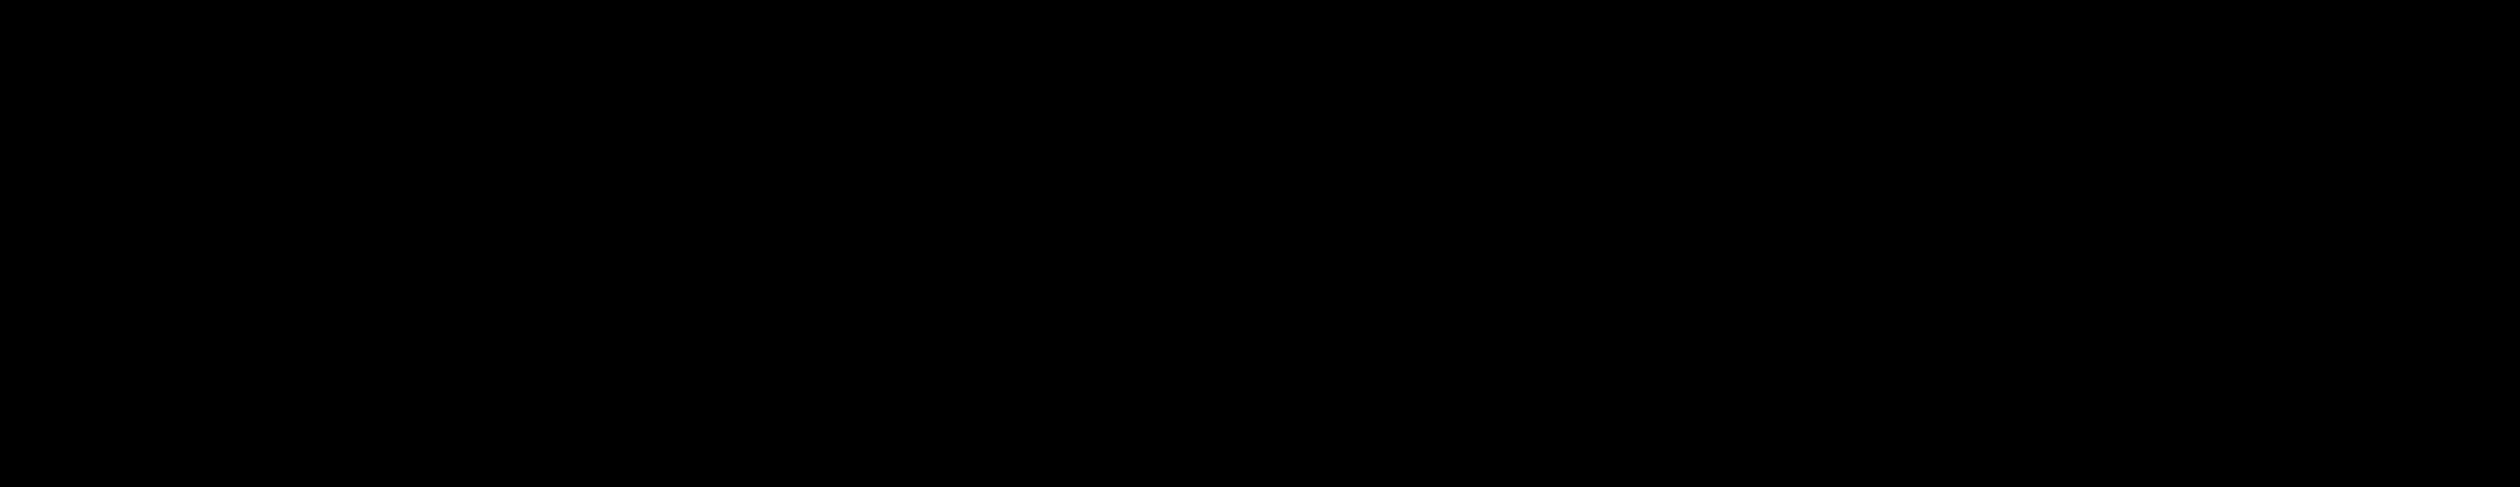 Illustrated Glossary of Organic Chemistry - Disulfide bridge